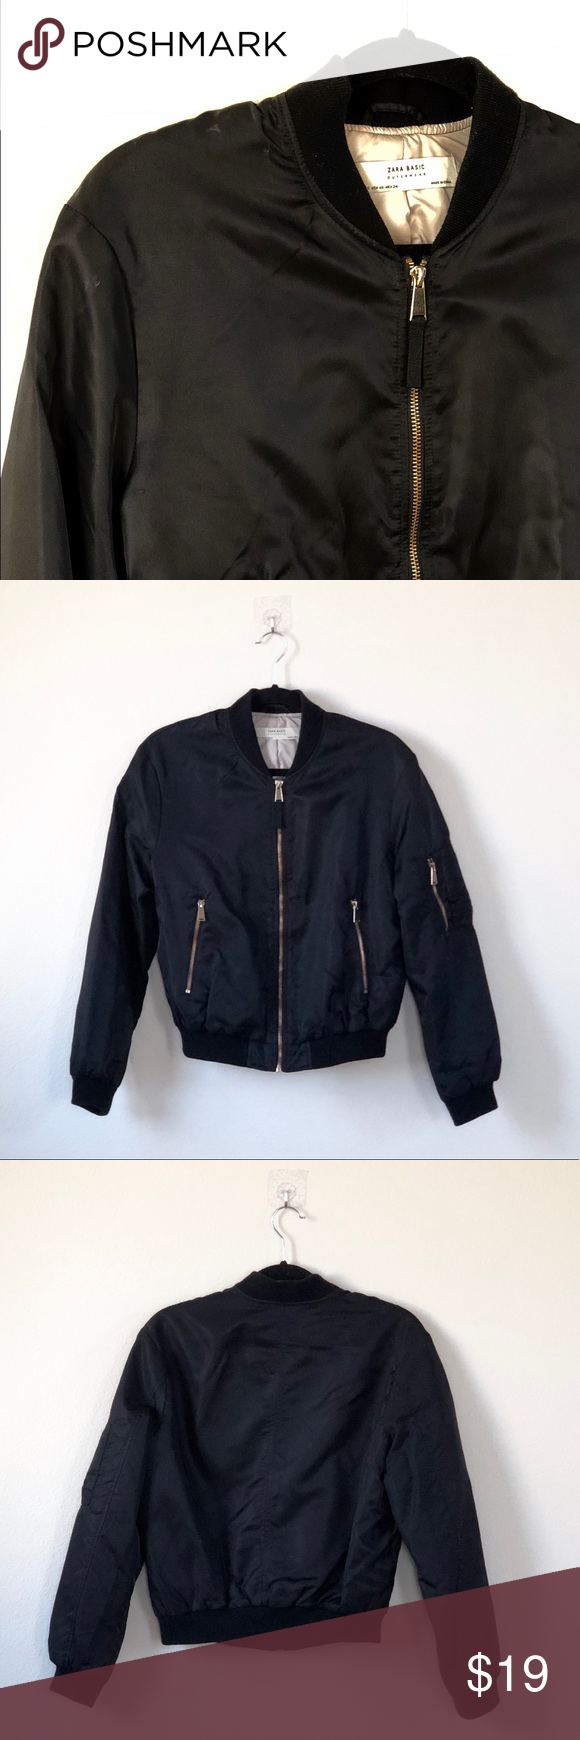 Zara Women Black Bomber Jacket With Gold Detailing Black Bomber Jacket Bomber Jacket Jackets [ 1740 x 580 Pixel ]